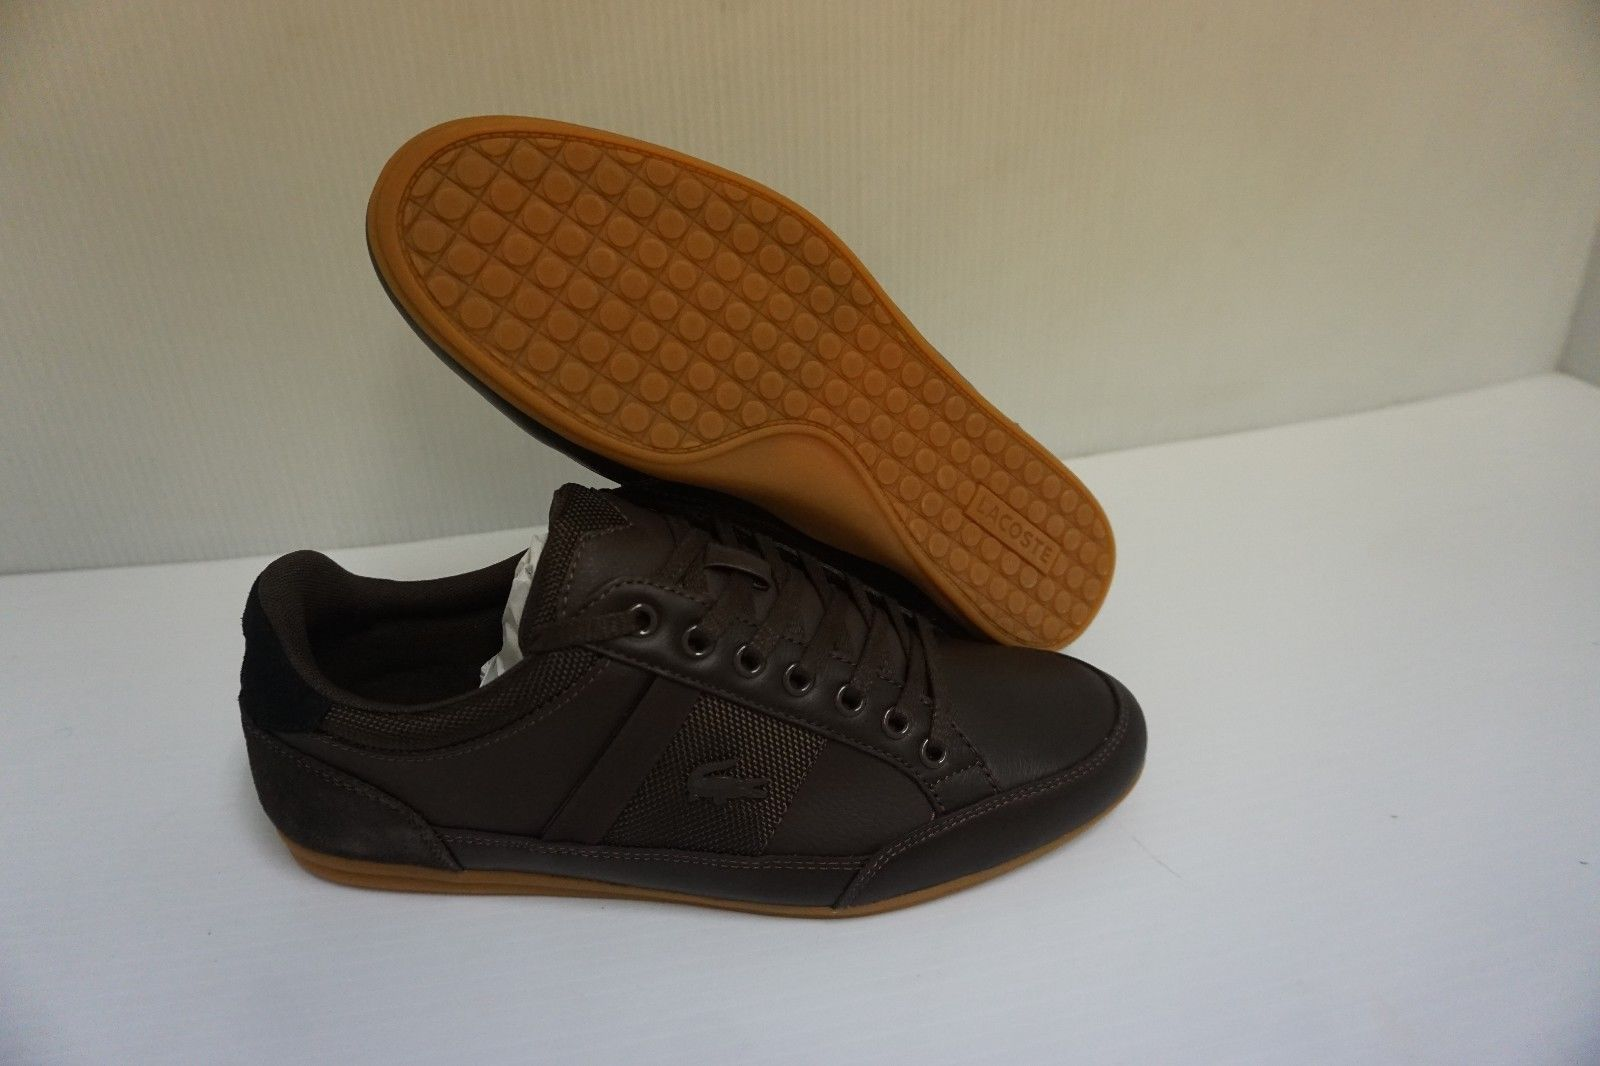 f548fdb0304ef7 Lacoste shoes chaymon 116 1 spm leather dark and 50 similar items. 57